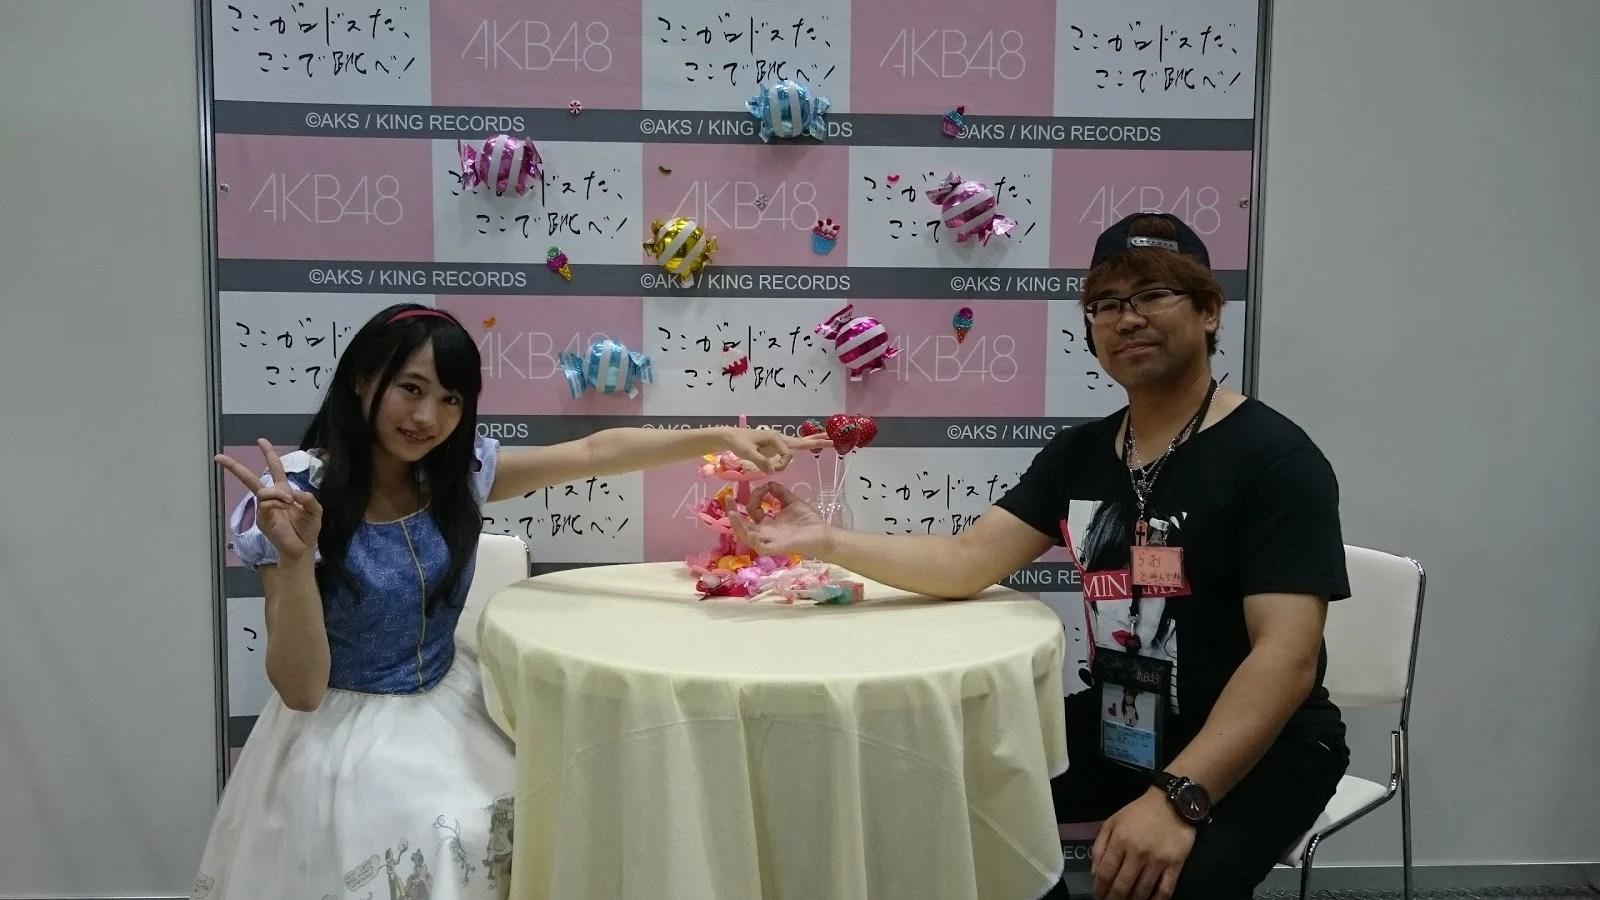 https://i1.wp.com/blogimg.goo.ne.jp/user_image/18/88/b246620a67233eb65dfe44a68874a20b.jpg